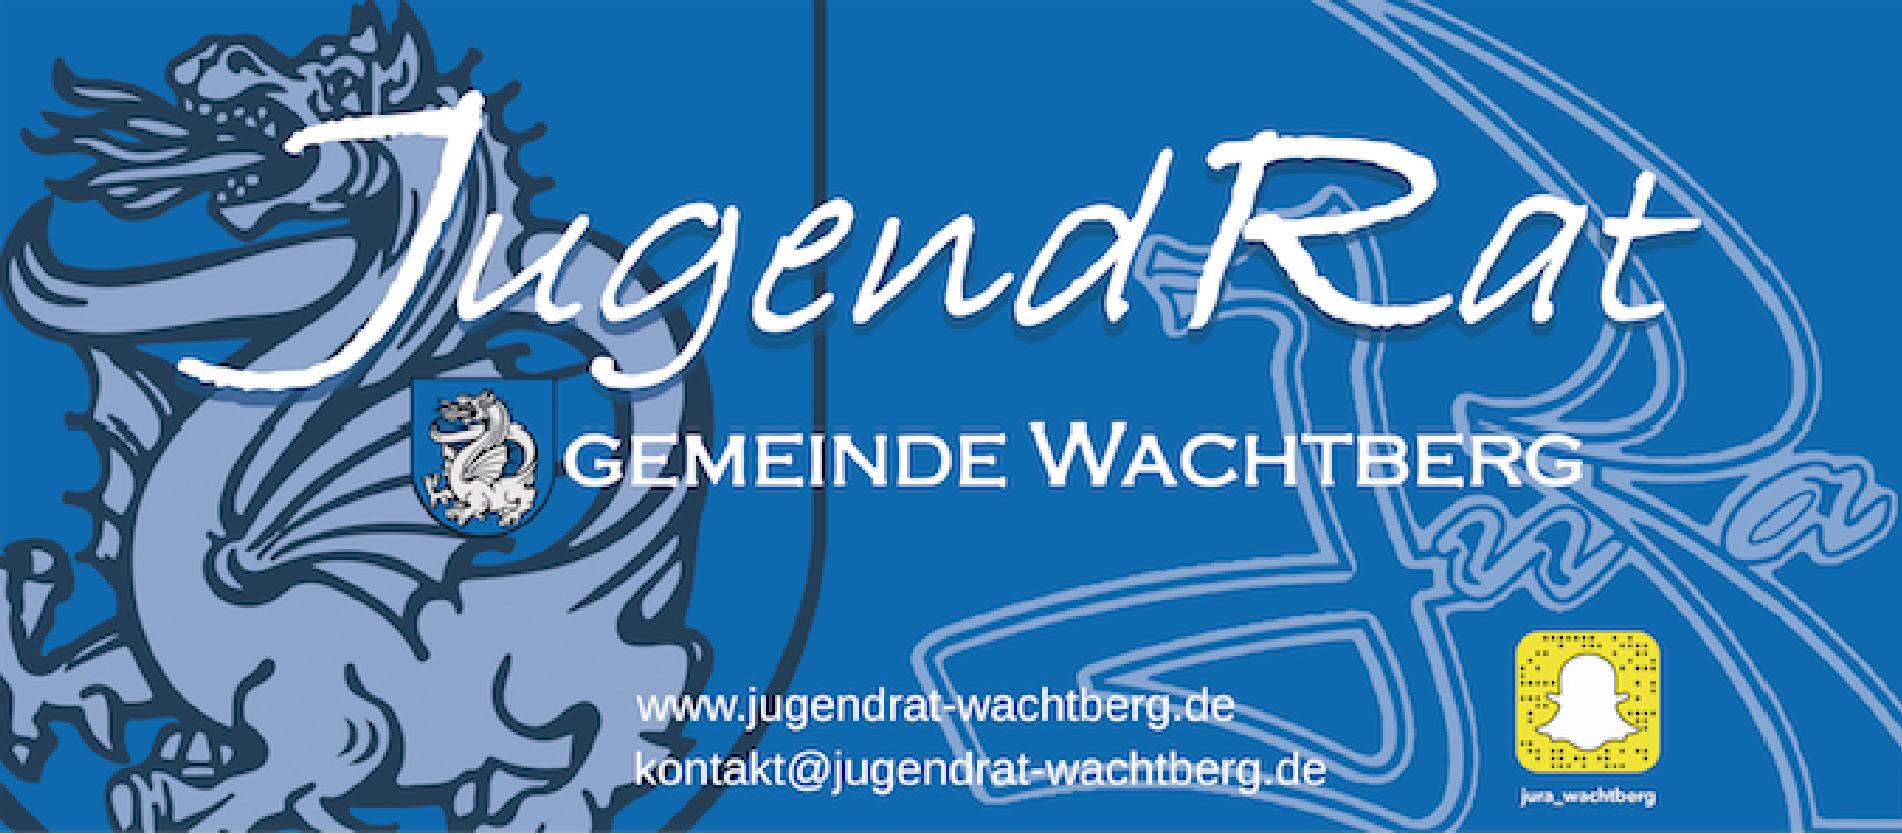 Jugendrat Wachtberg